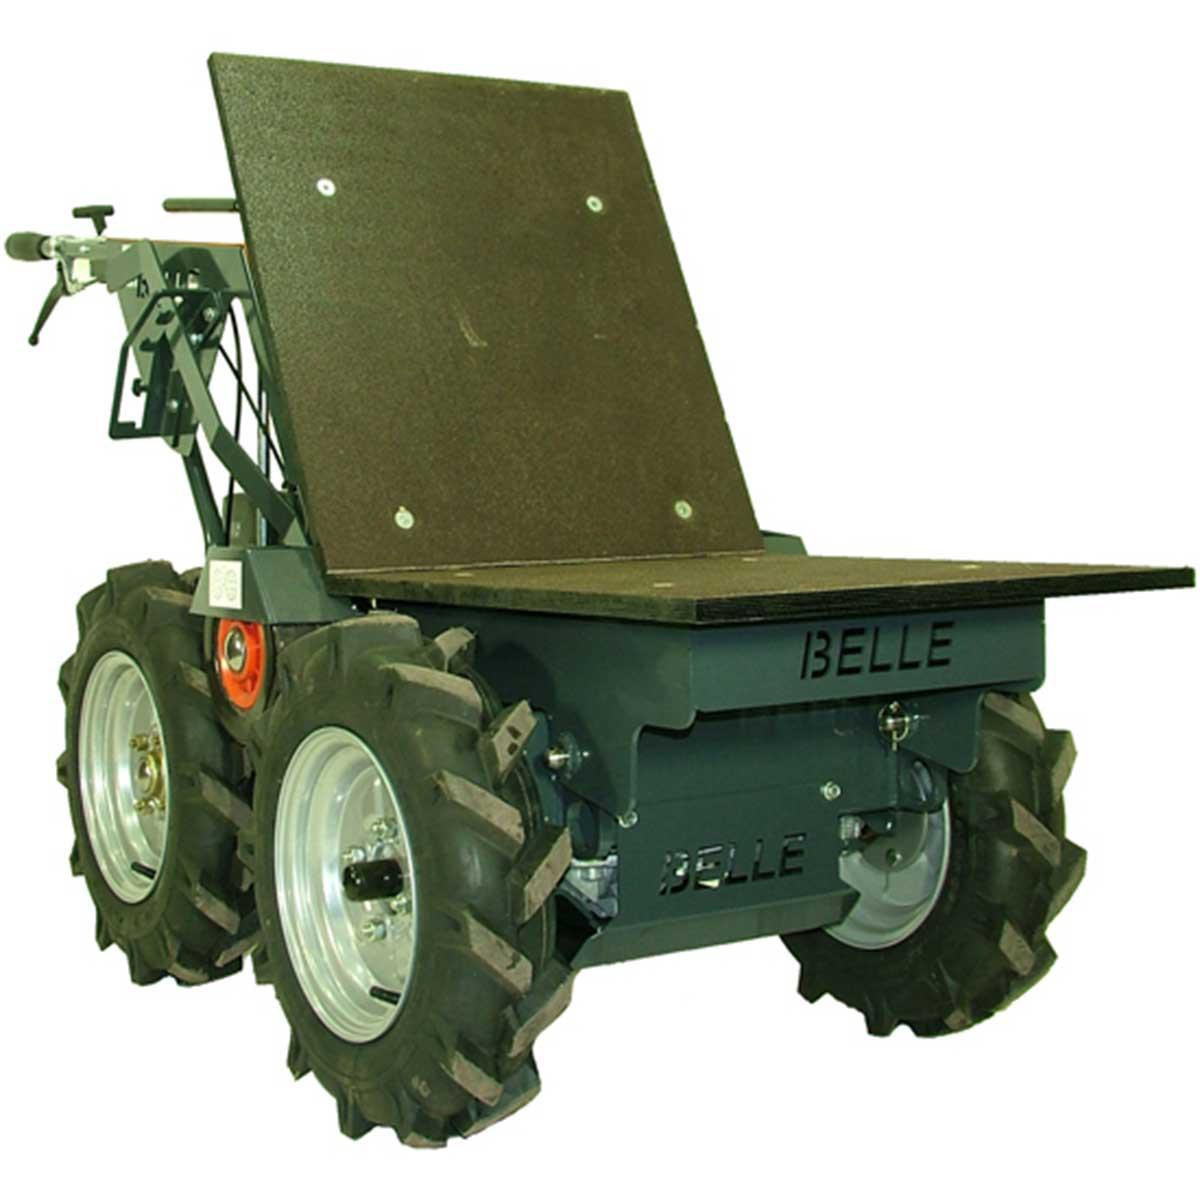 OPD/01/DIO Flatbed for BMD 300 Mini Dumper